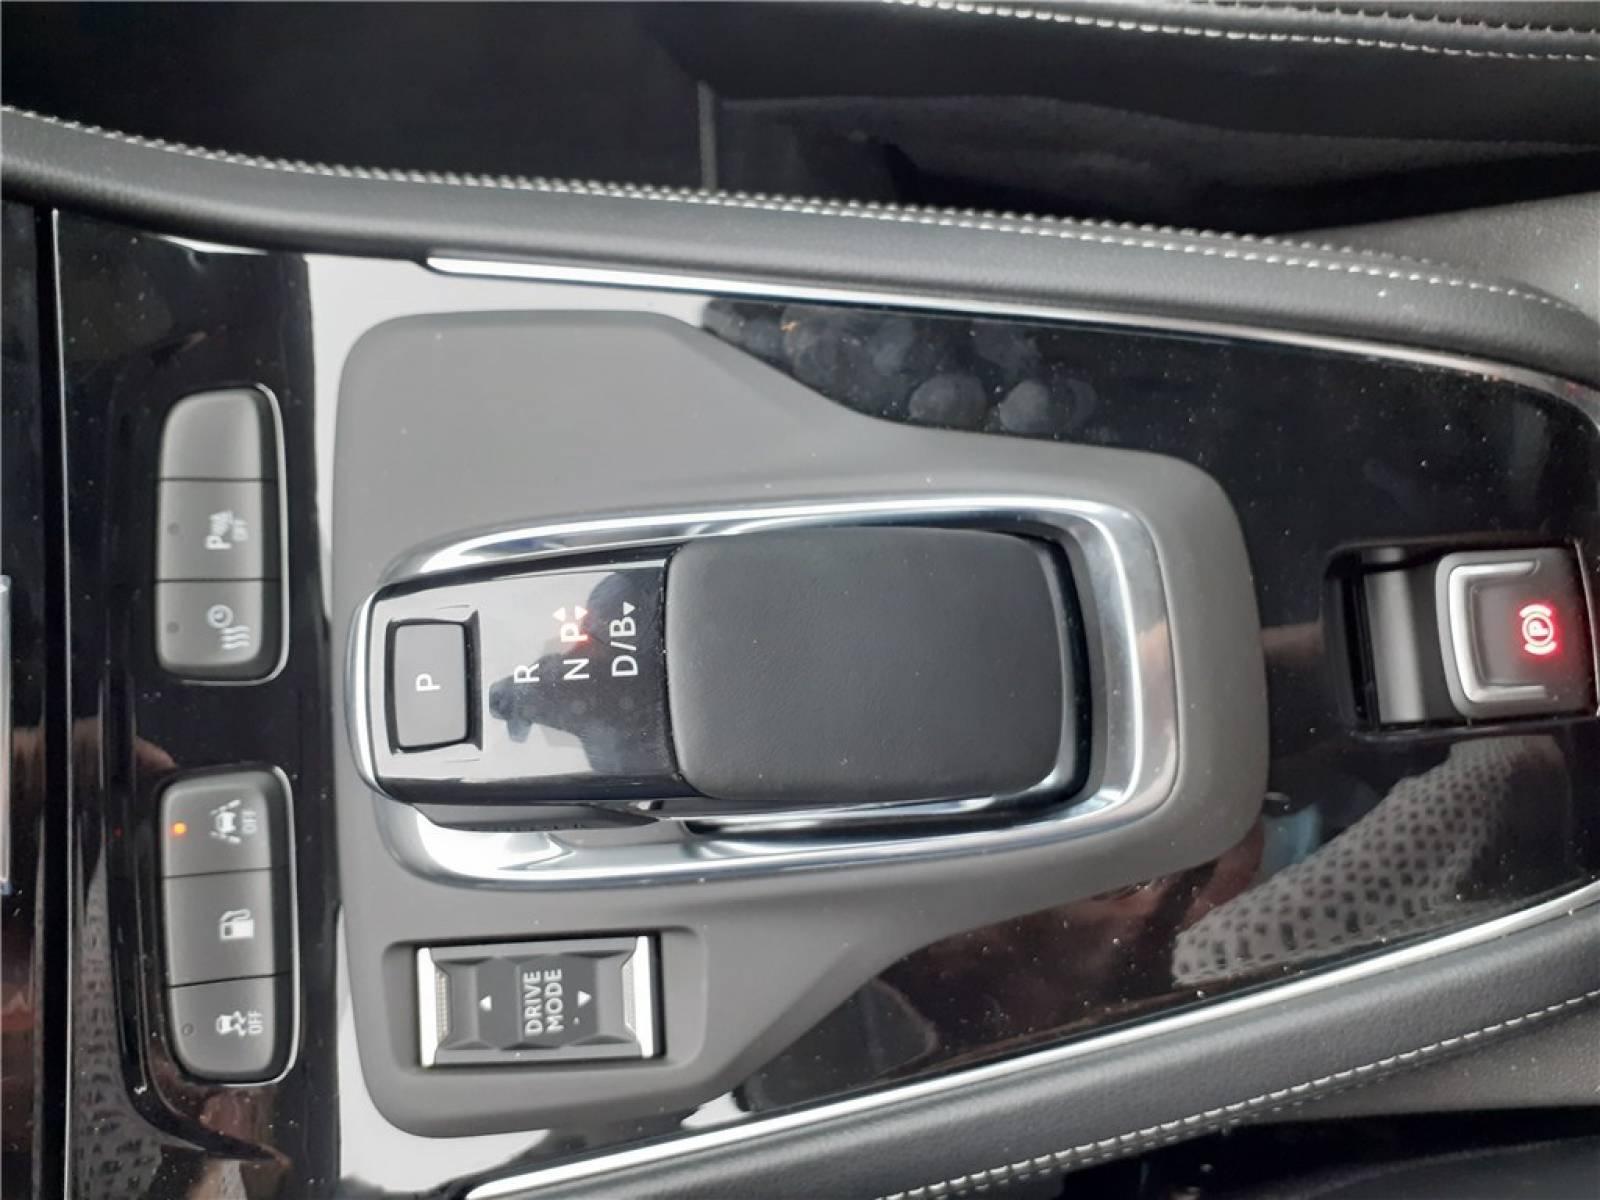 OPEL Grandland X Hybrid 225 ch BVA8 - véhicule d'occasion - Groupe Guillet - Opel Magicauto - Chalon-sur-Saône - 71380 - Saint-Marcel - 51